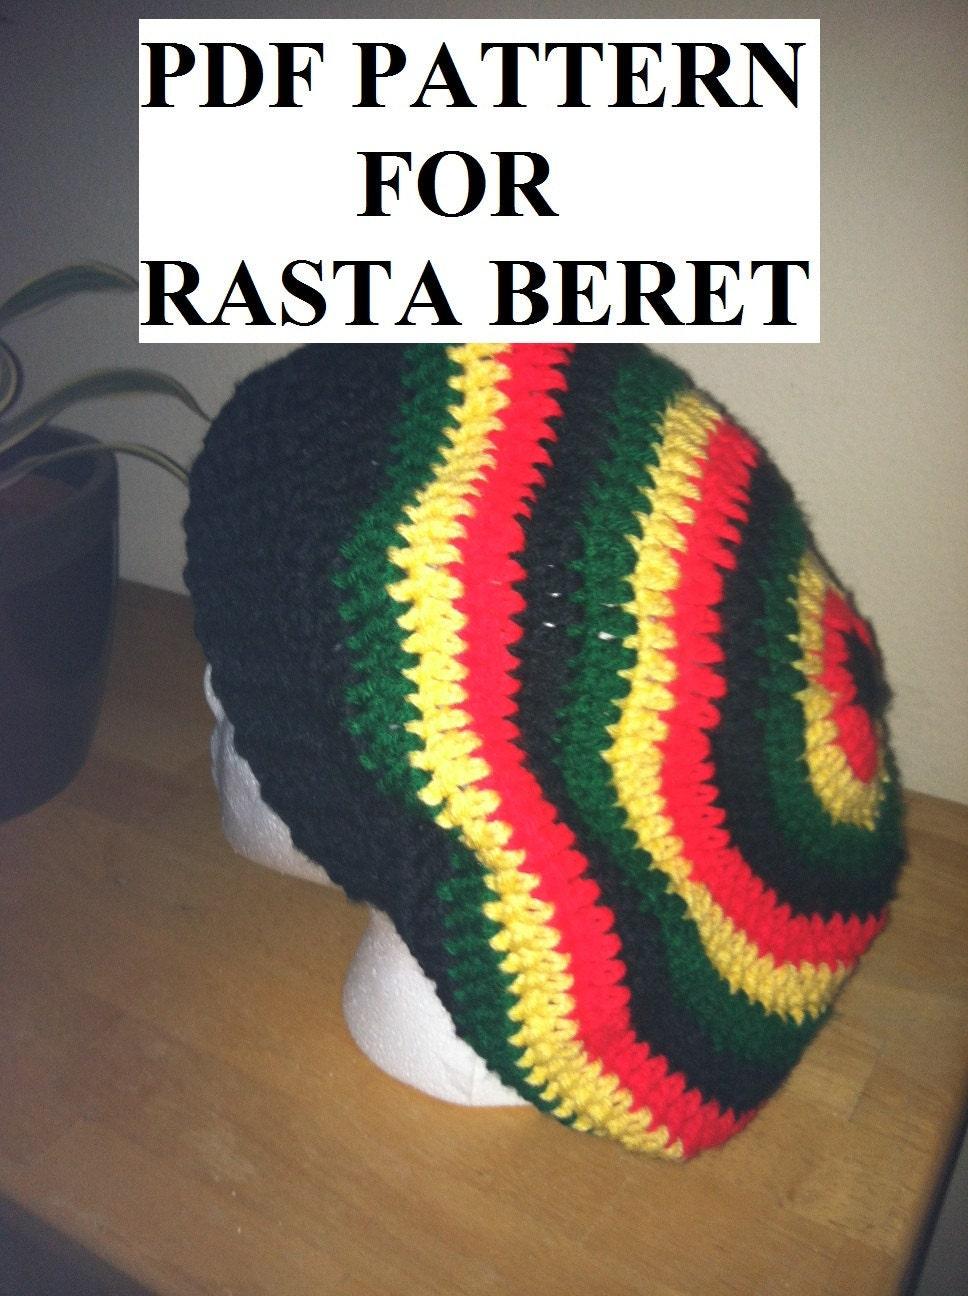 Rasta Hat Dreadlocks   eBay - Electronics, Cars, Fashion